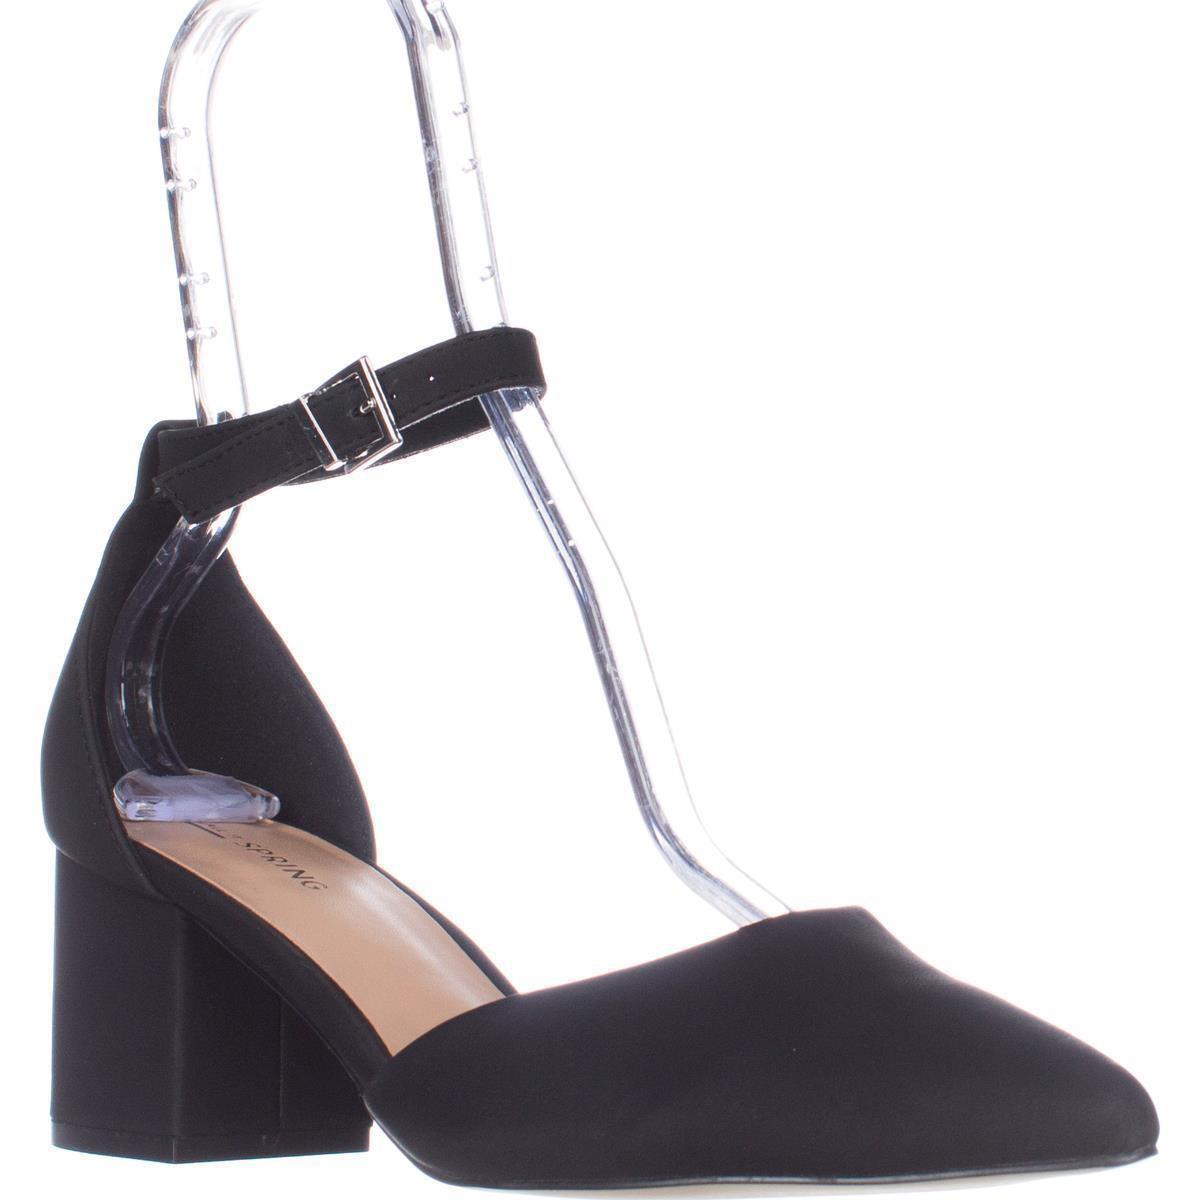 6f87ec8ac9a Call It Spring Trivio Ankle Strap Block Heel Sandals in Black - Lyst